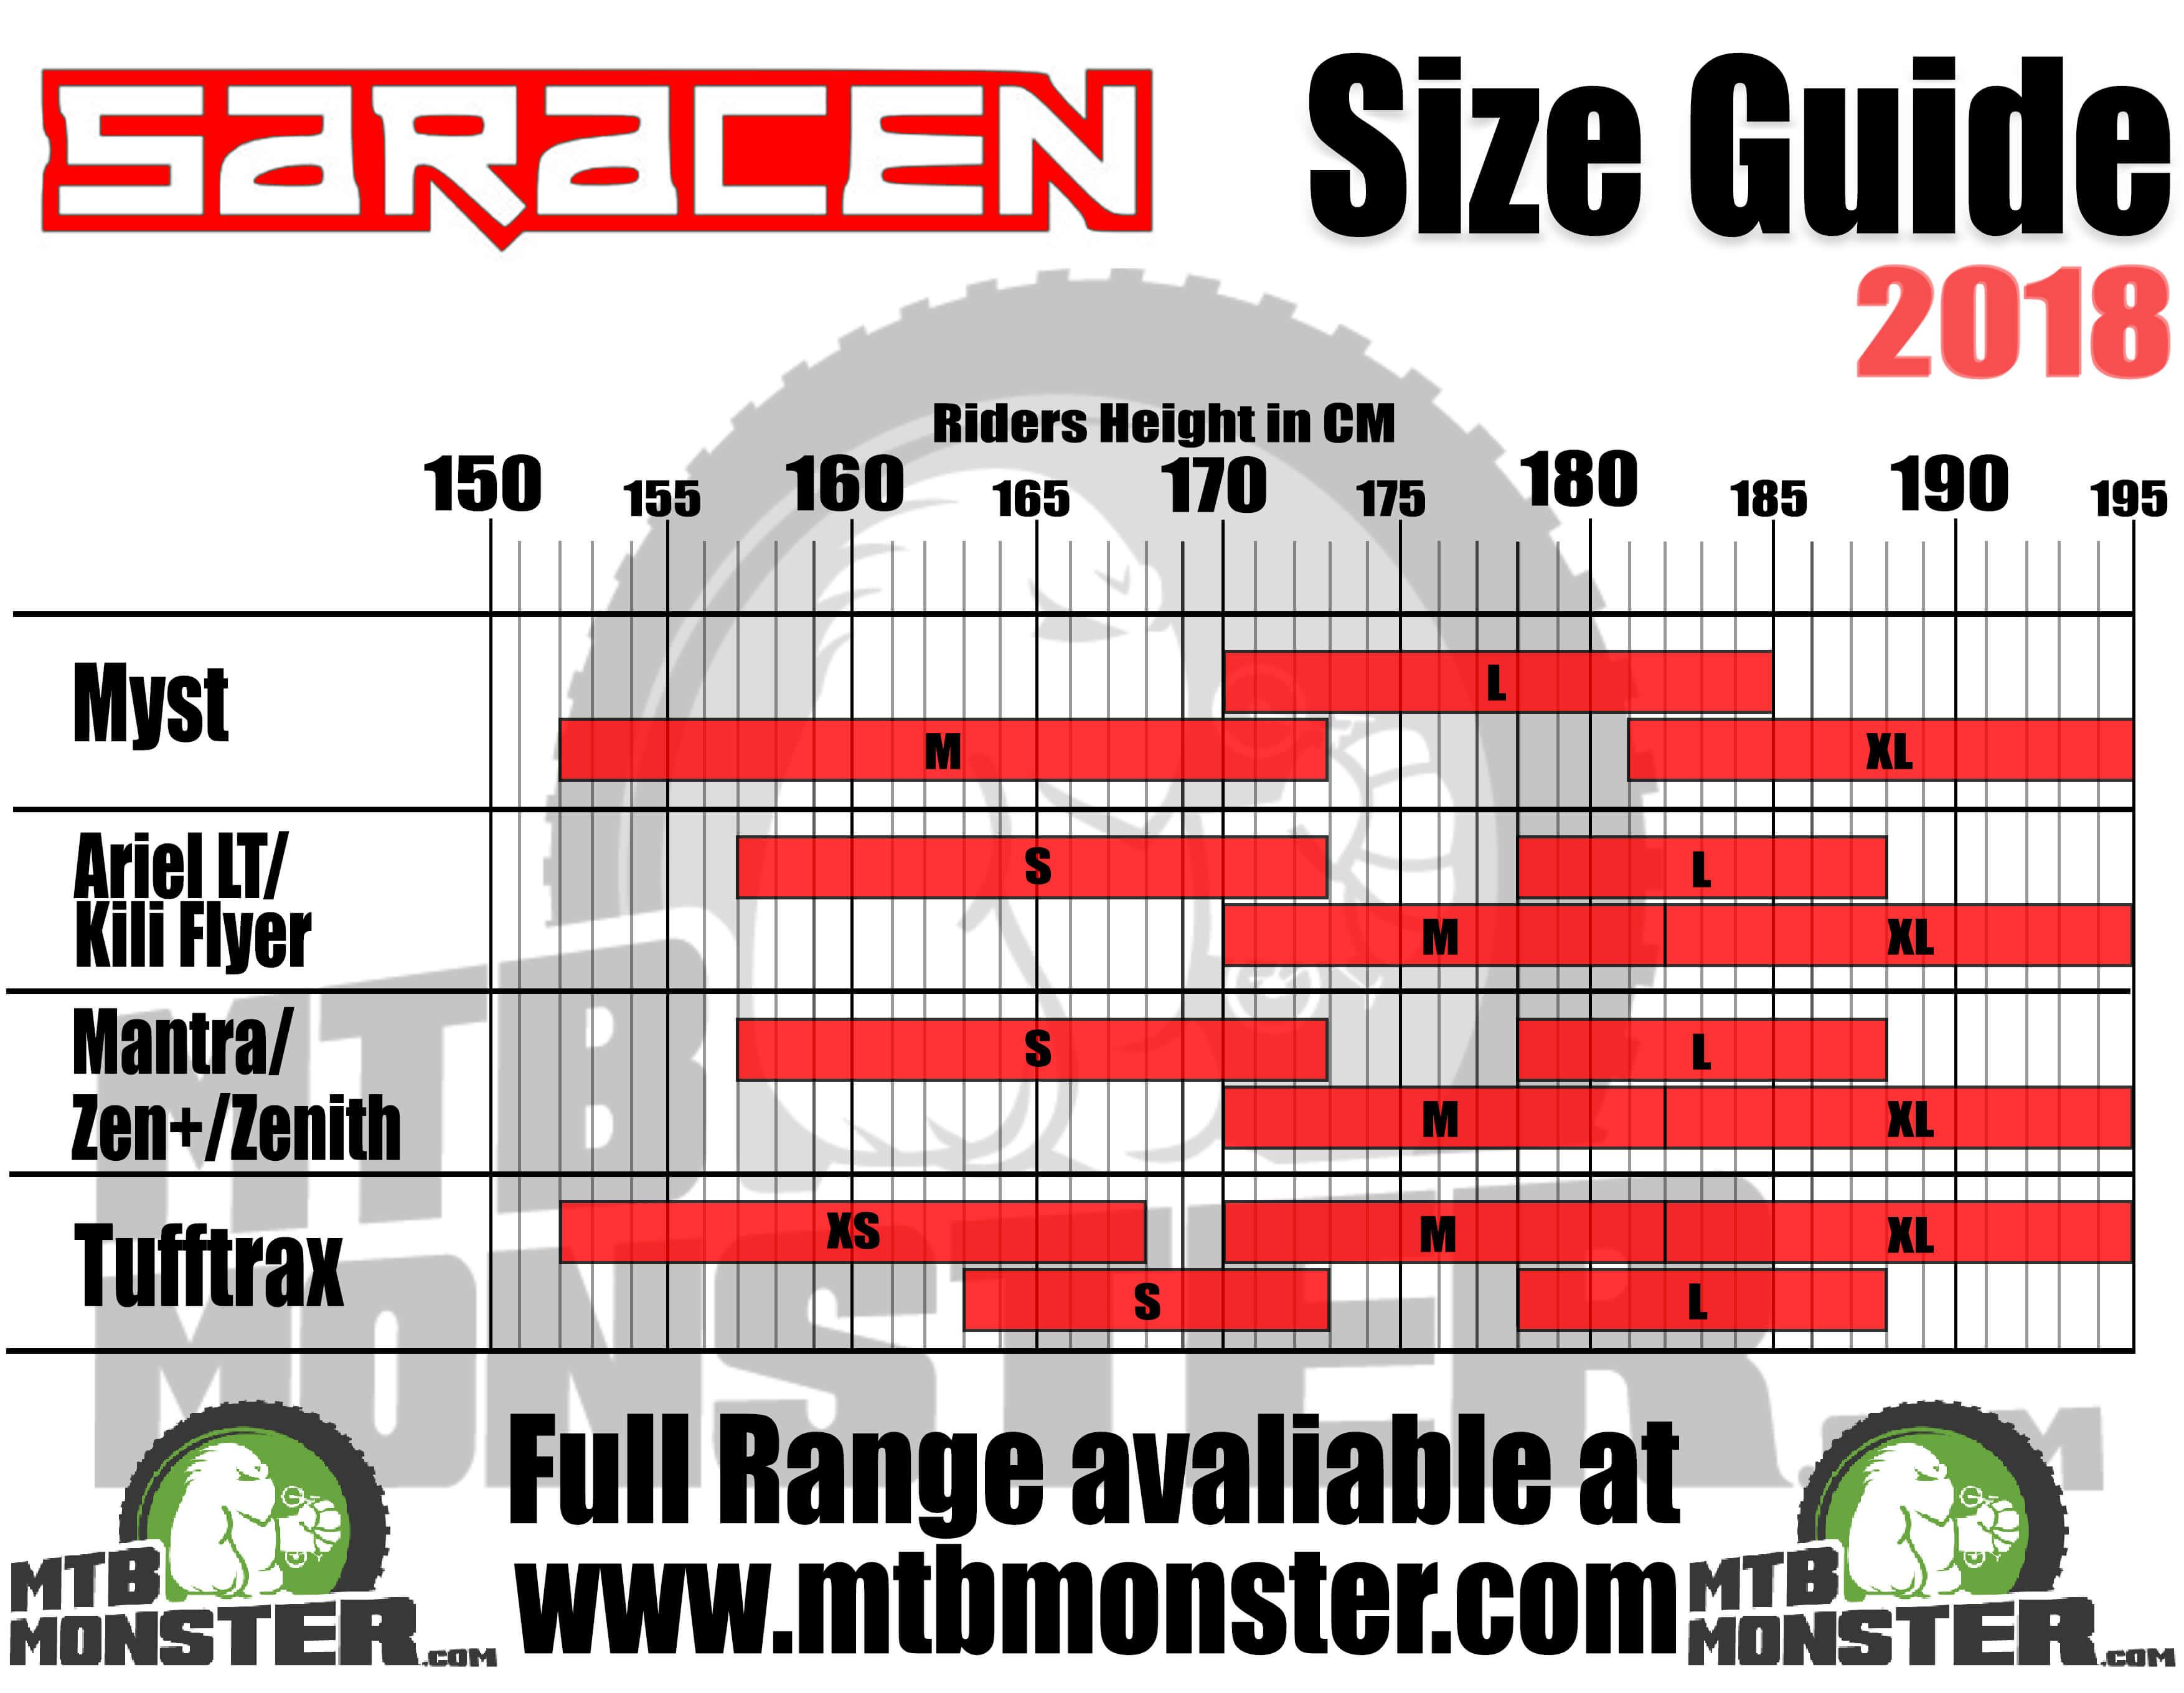 Saracen Bikes Size Guide, Saracen Bikes Sizing Chart 2018